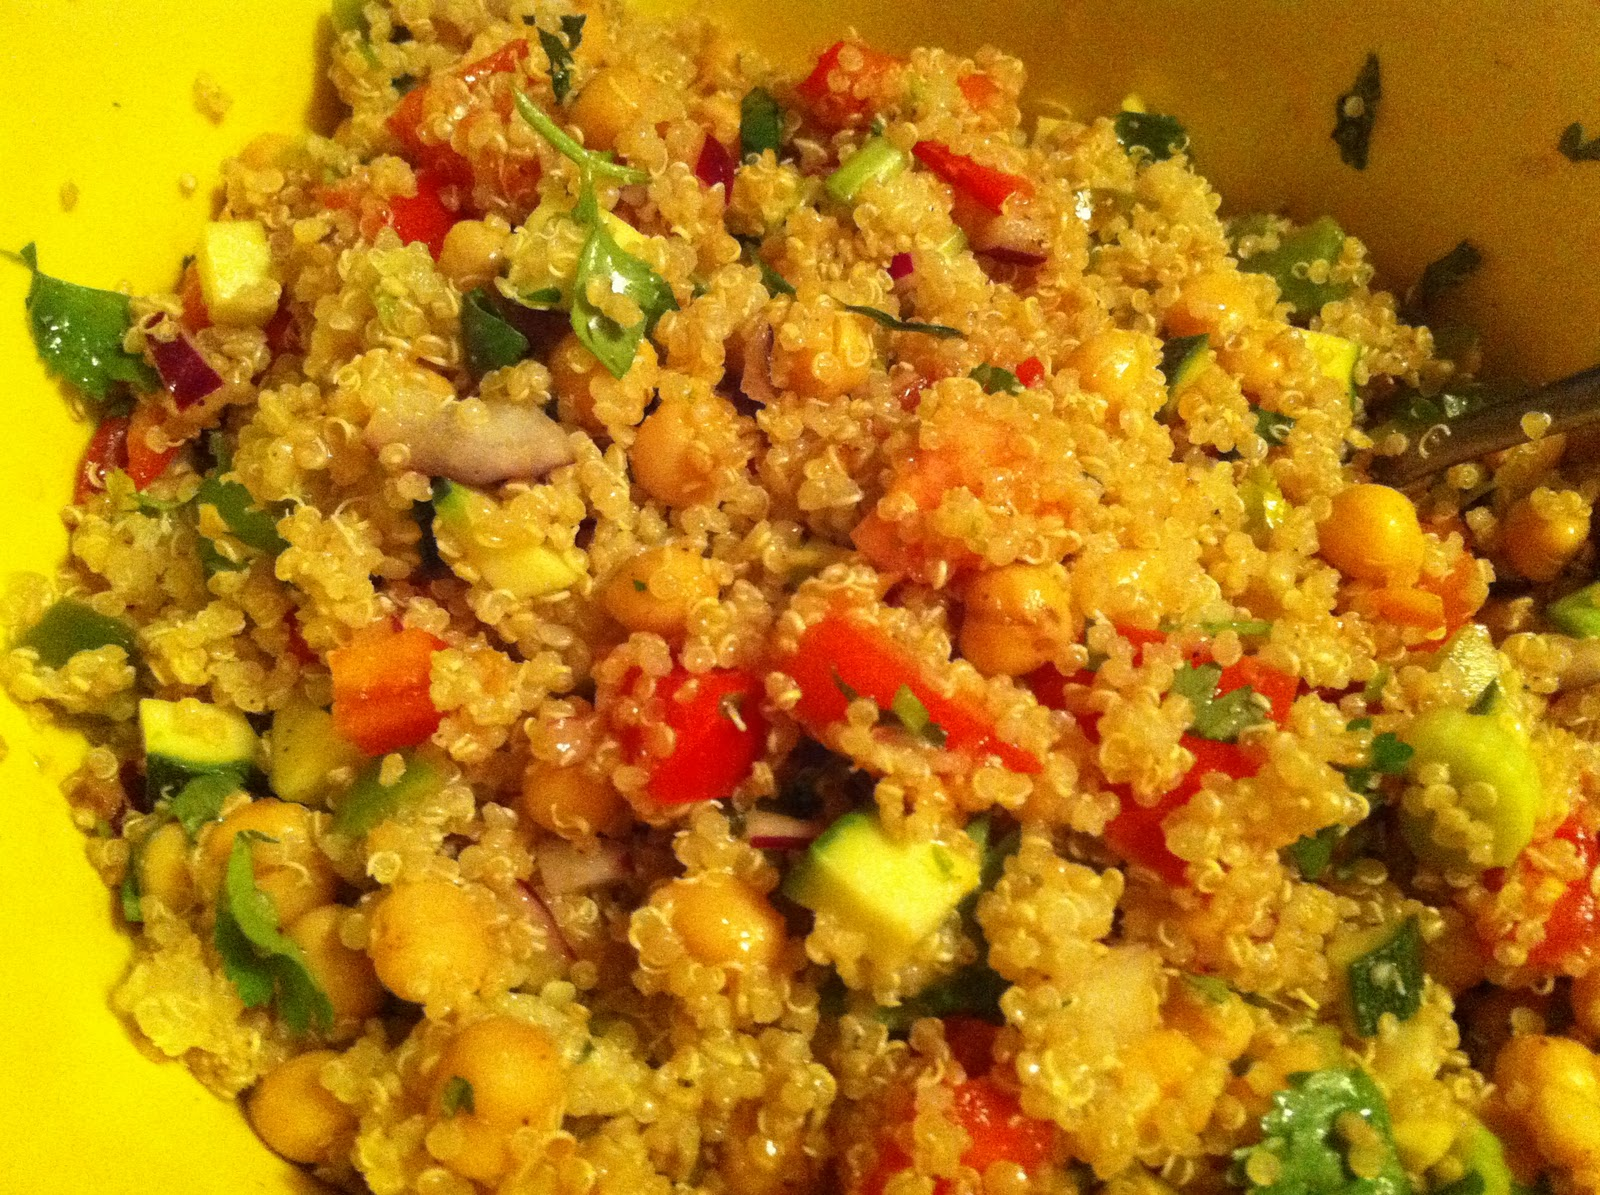 ... : recipes from the Satellite of Love: Quinoa Garbanzo Bean Taco Salad